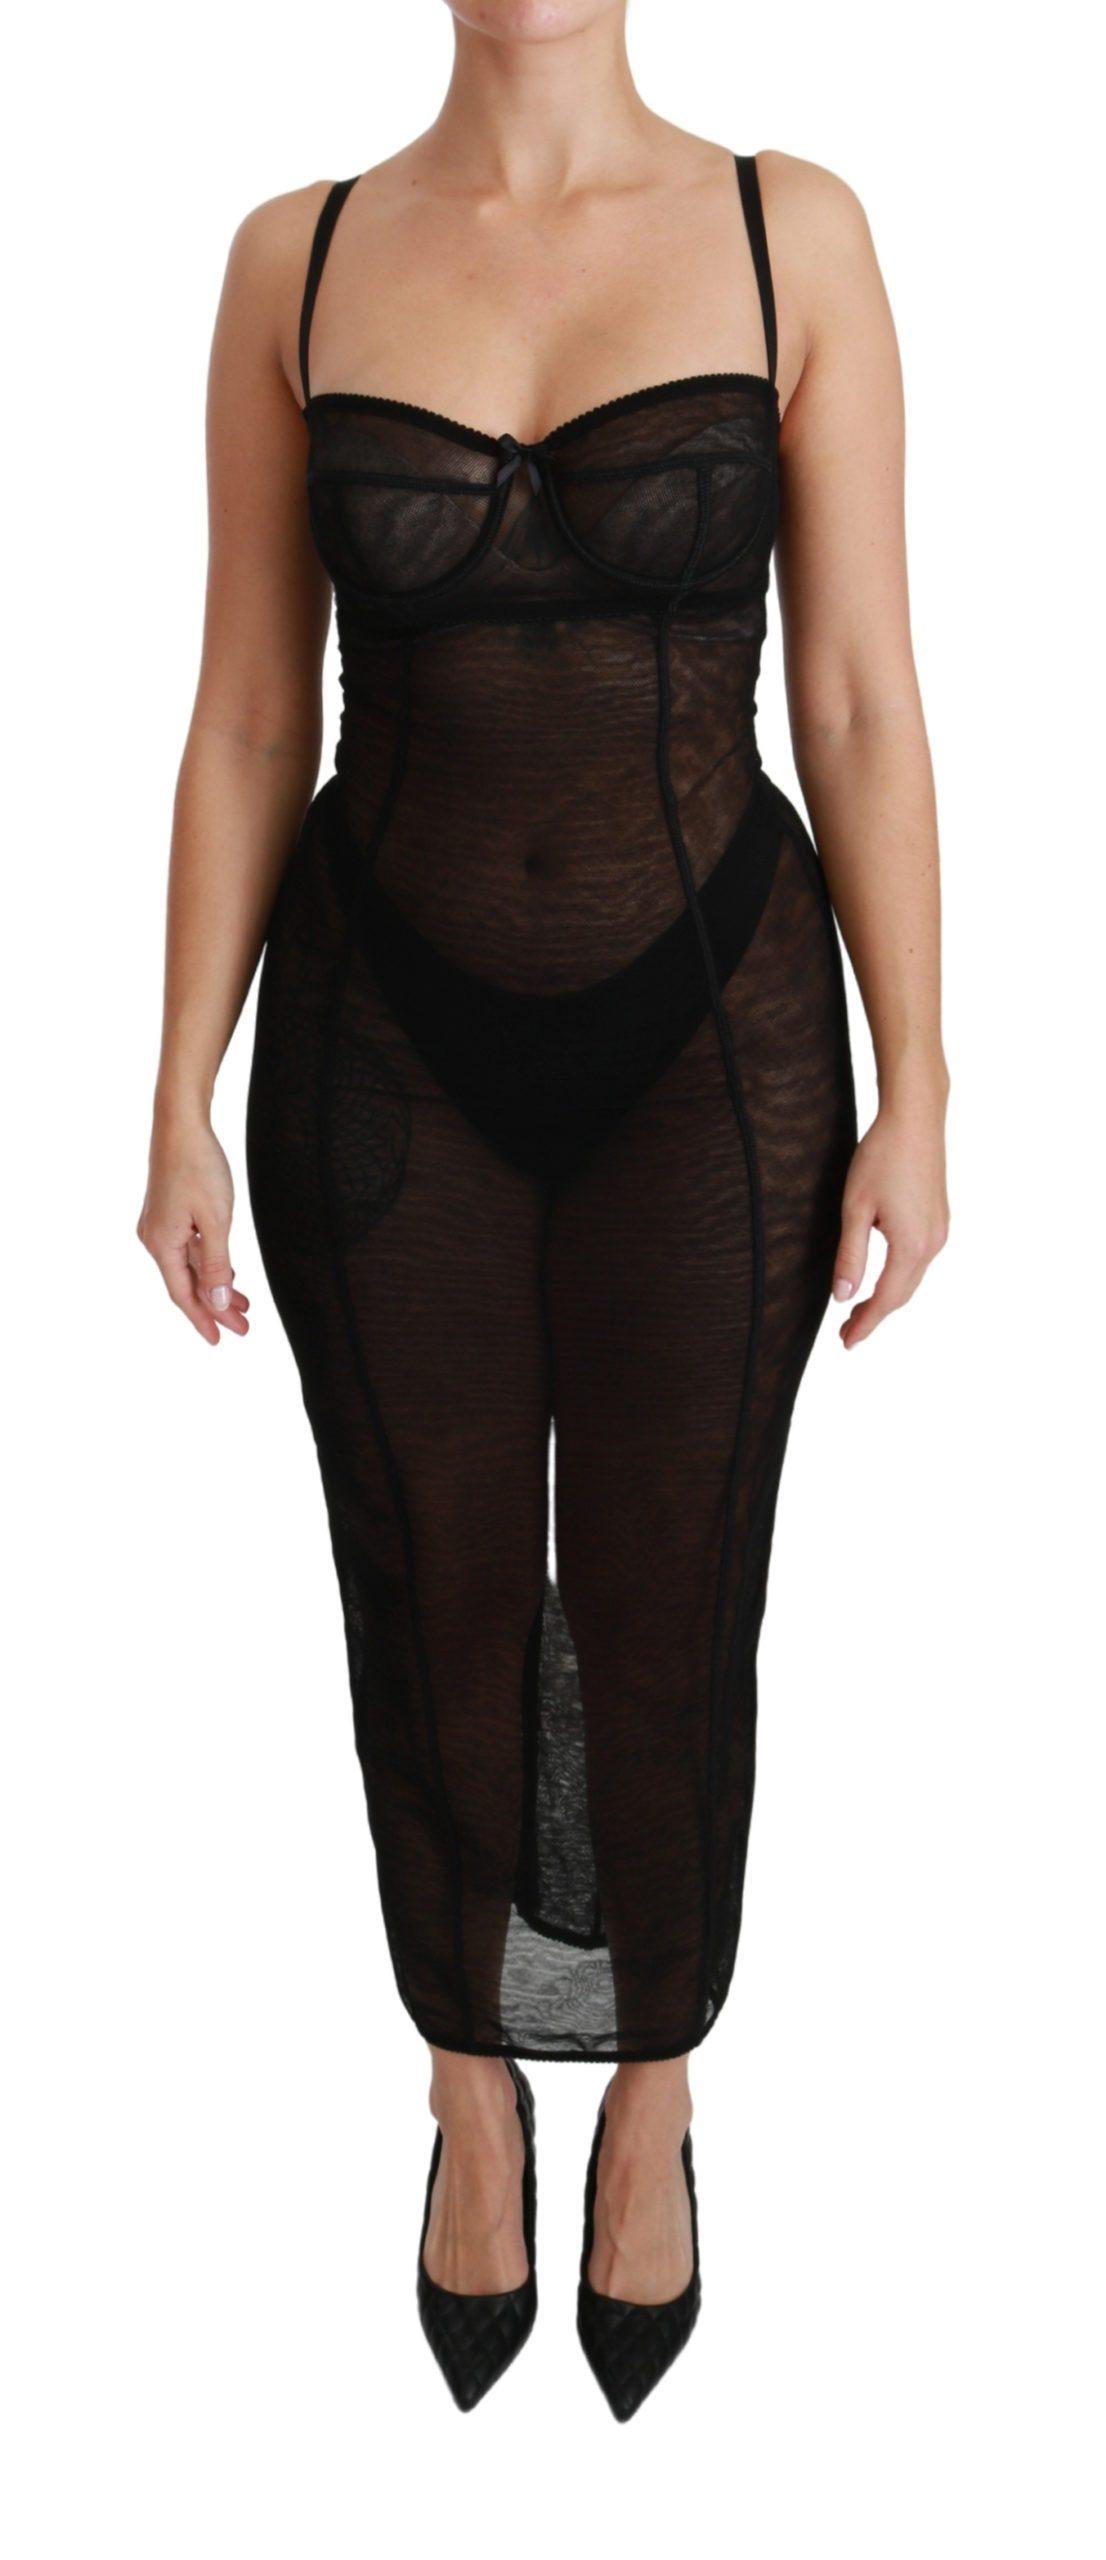 Dolce & Gabbana Women's Sheer Mesh Corset Bustier Dress Black DR2487 - IT40|S